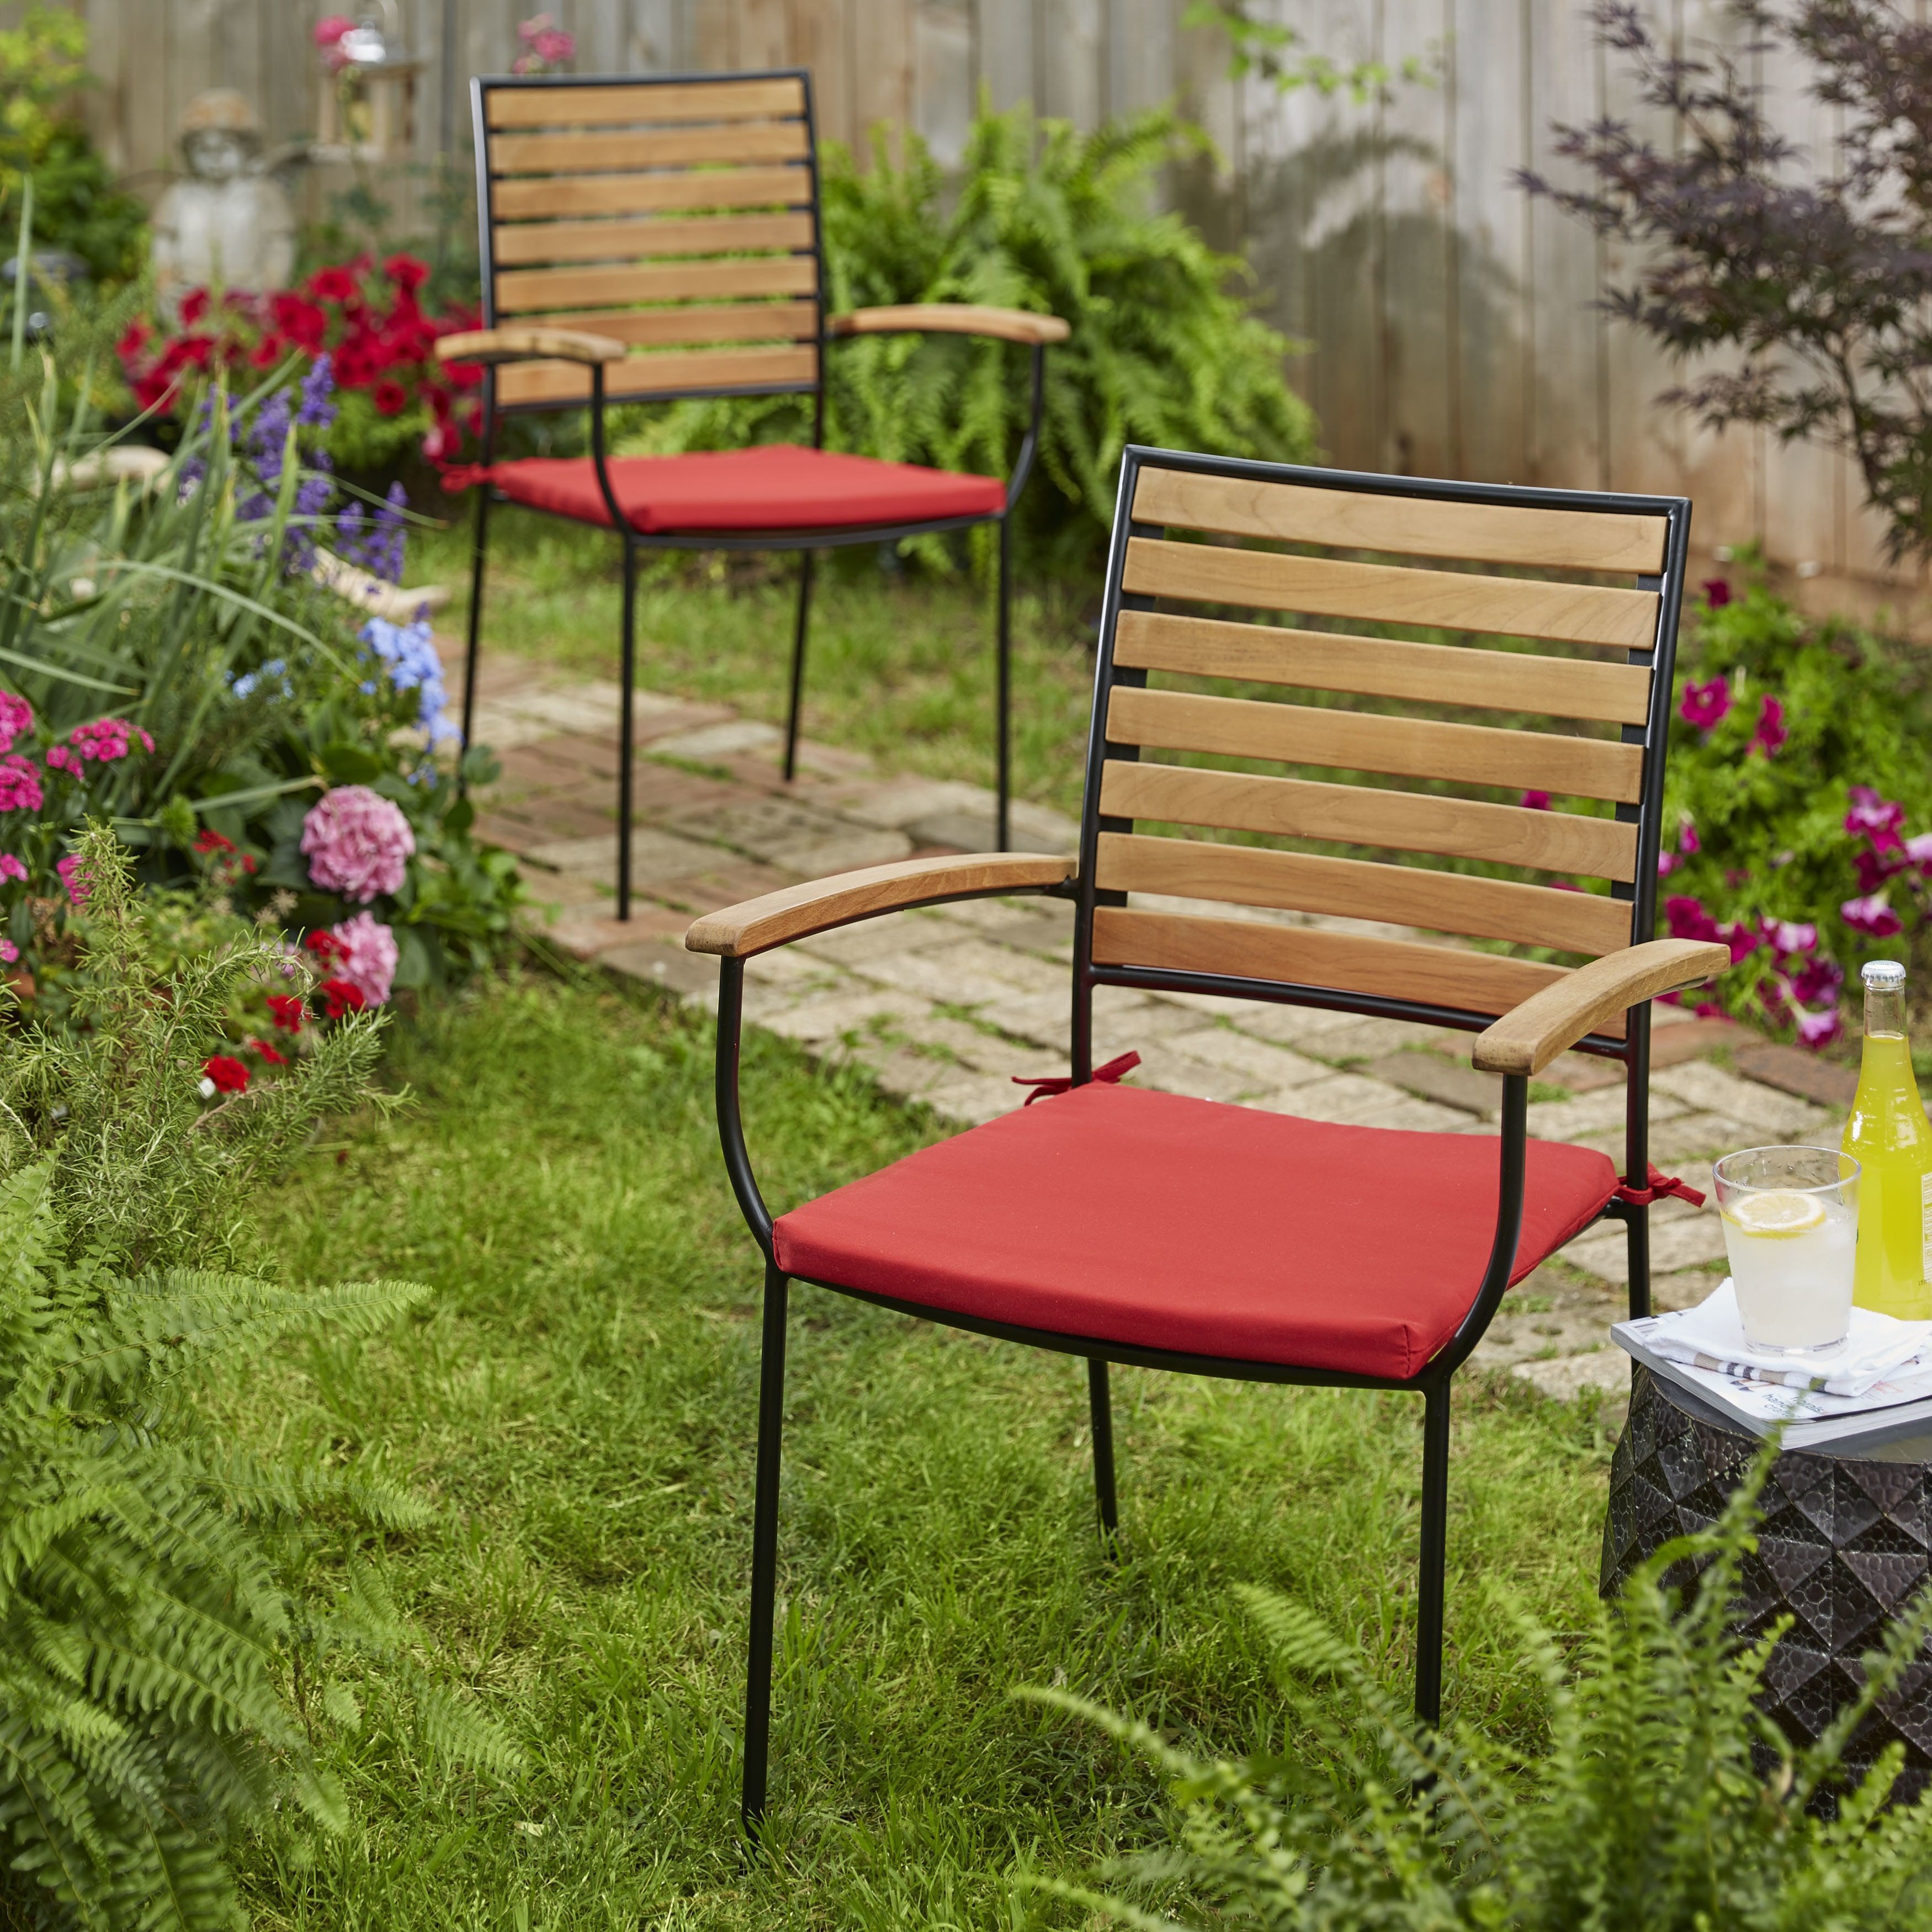 Kokomo Teak Dining Chair Cushion Set With Sunbrella Fabric (Jockey Red)  (Acrylic, Solid), Outdoor Cushion Part 85